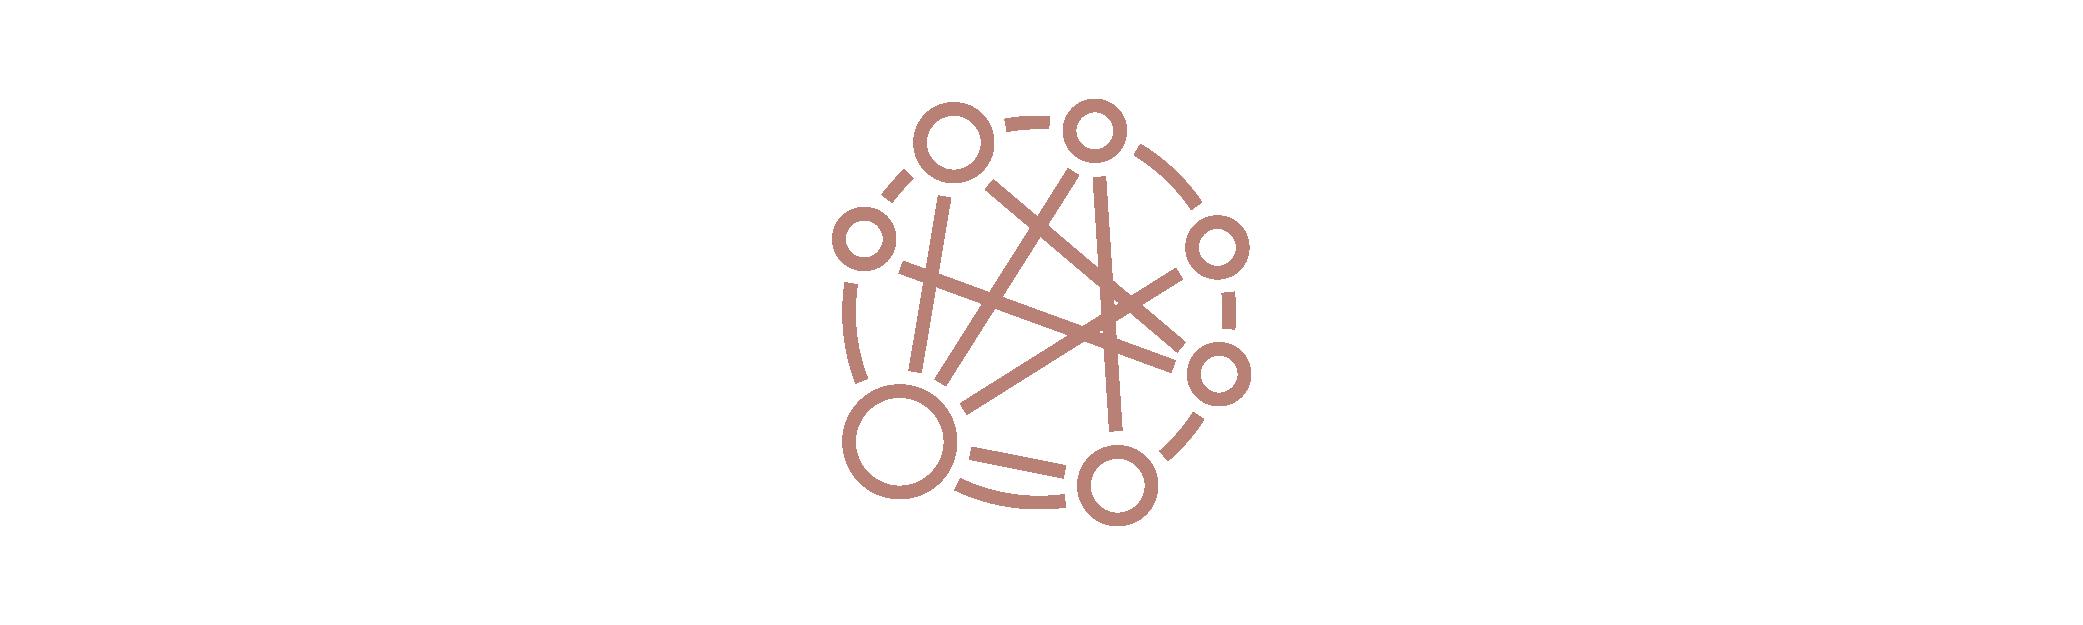 jvpartners-network-events.png